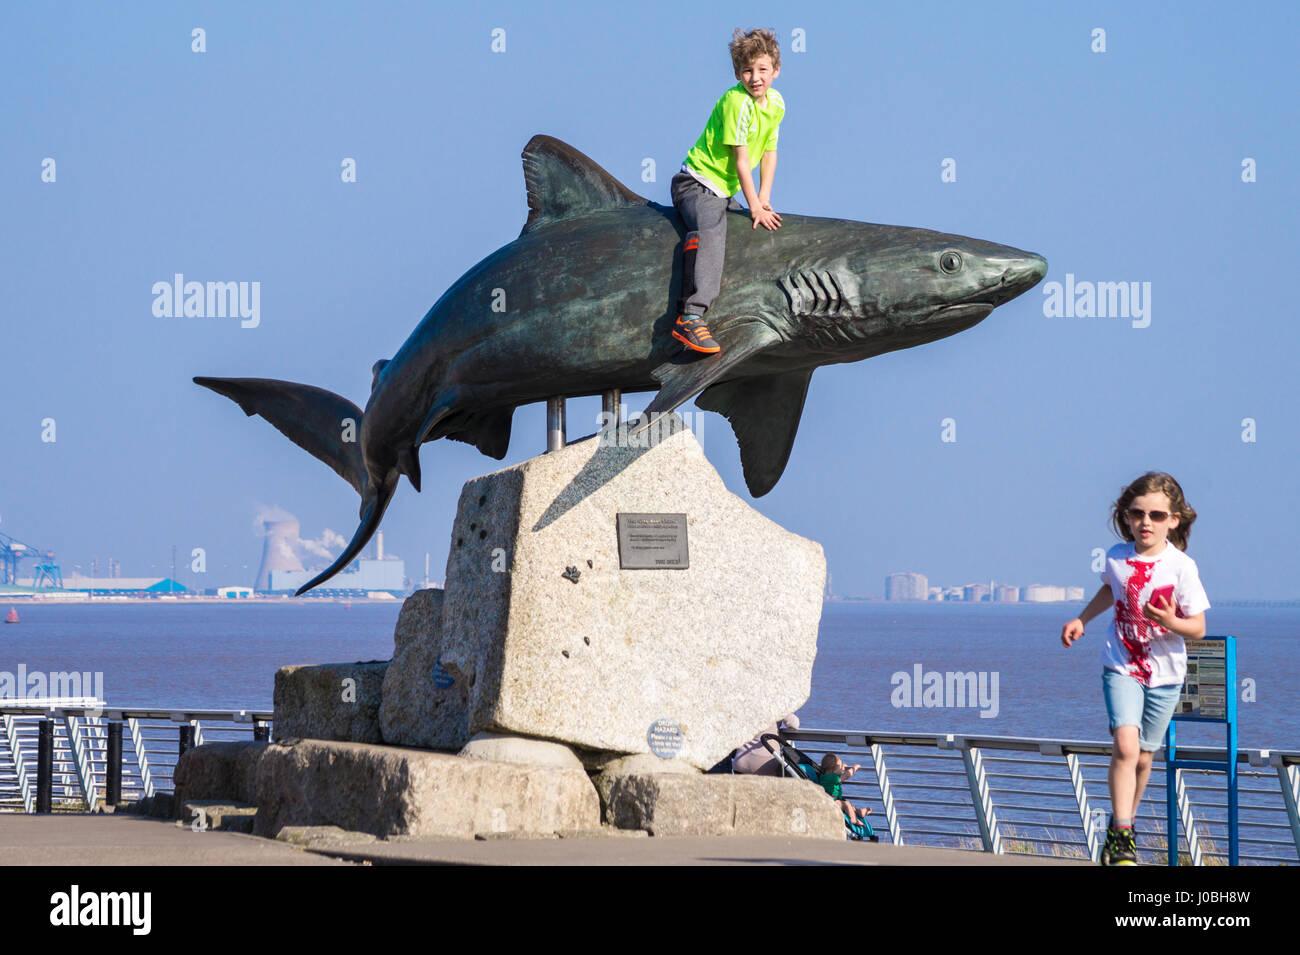 small-boy-sitting-on-shark-bronze-sculpture-of-grey-reef-shark-by-J0BH8W.jpg